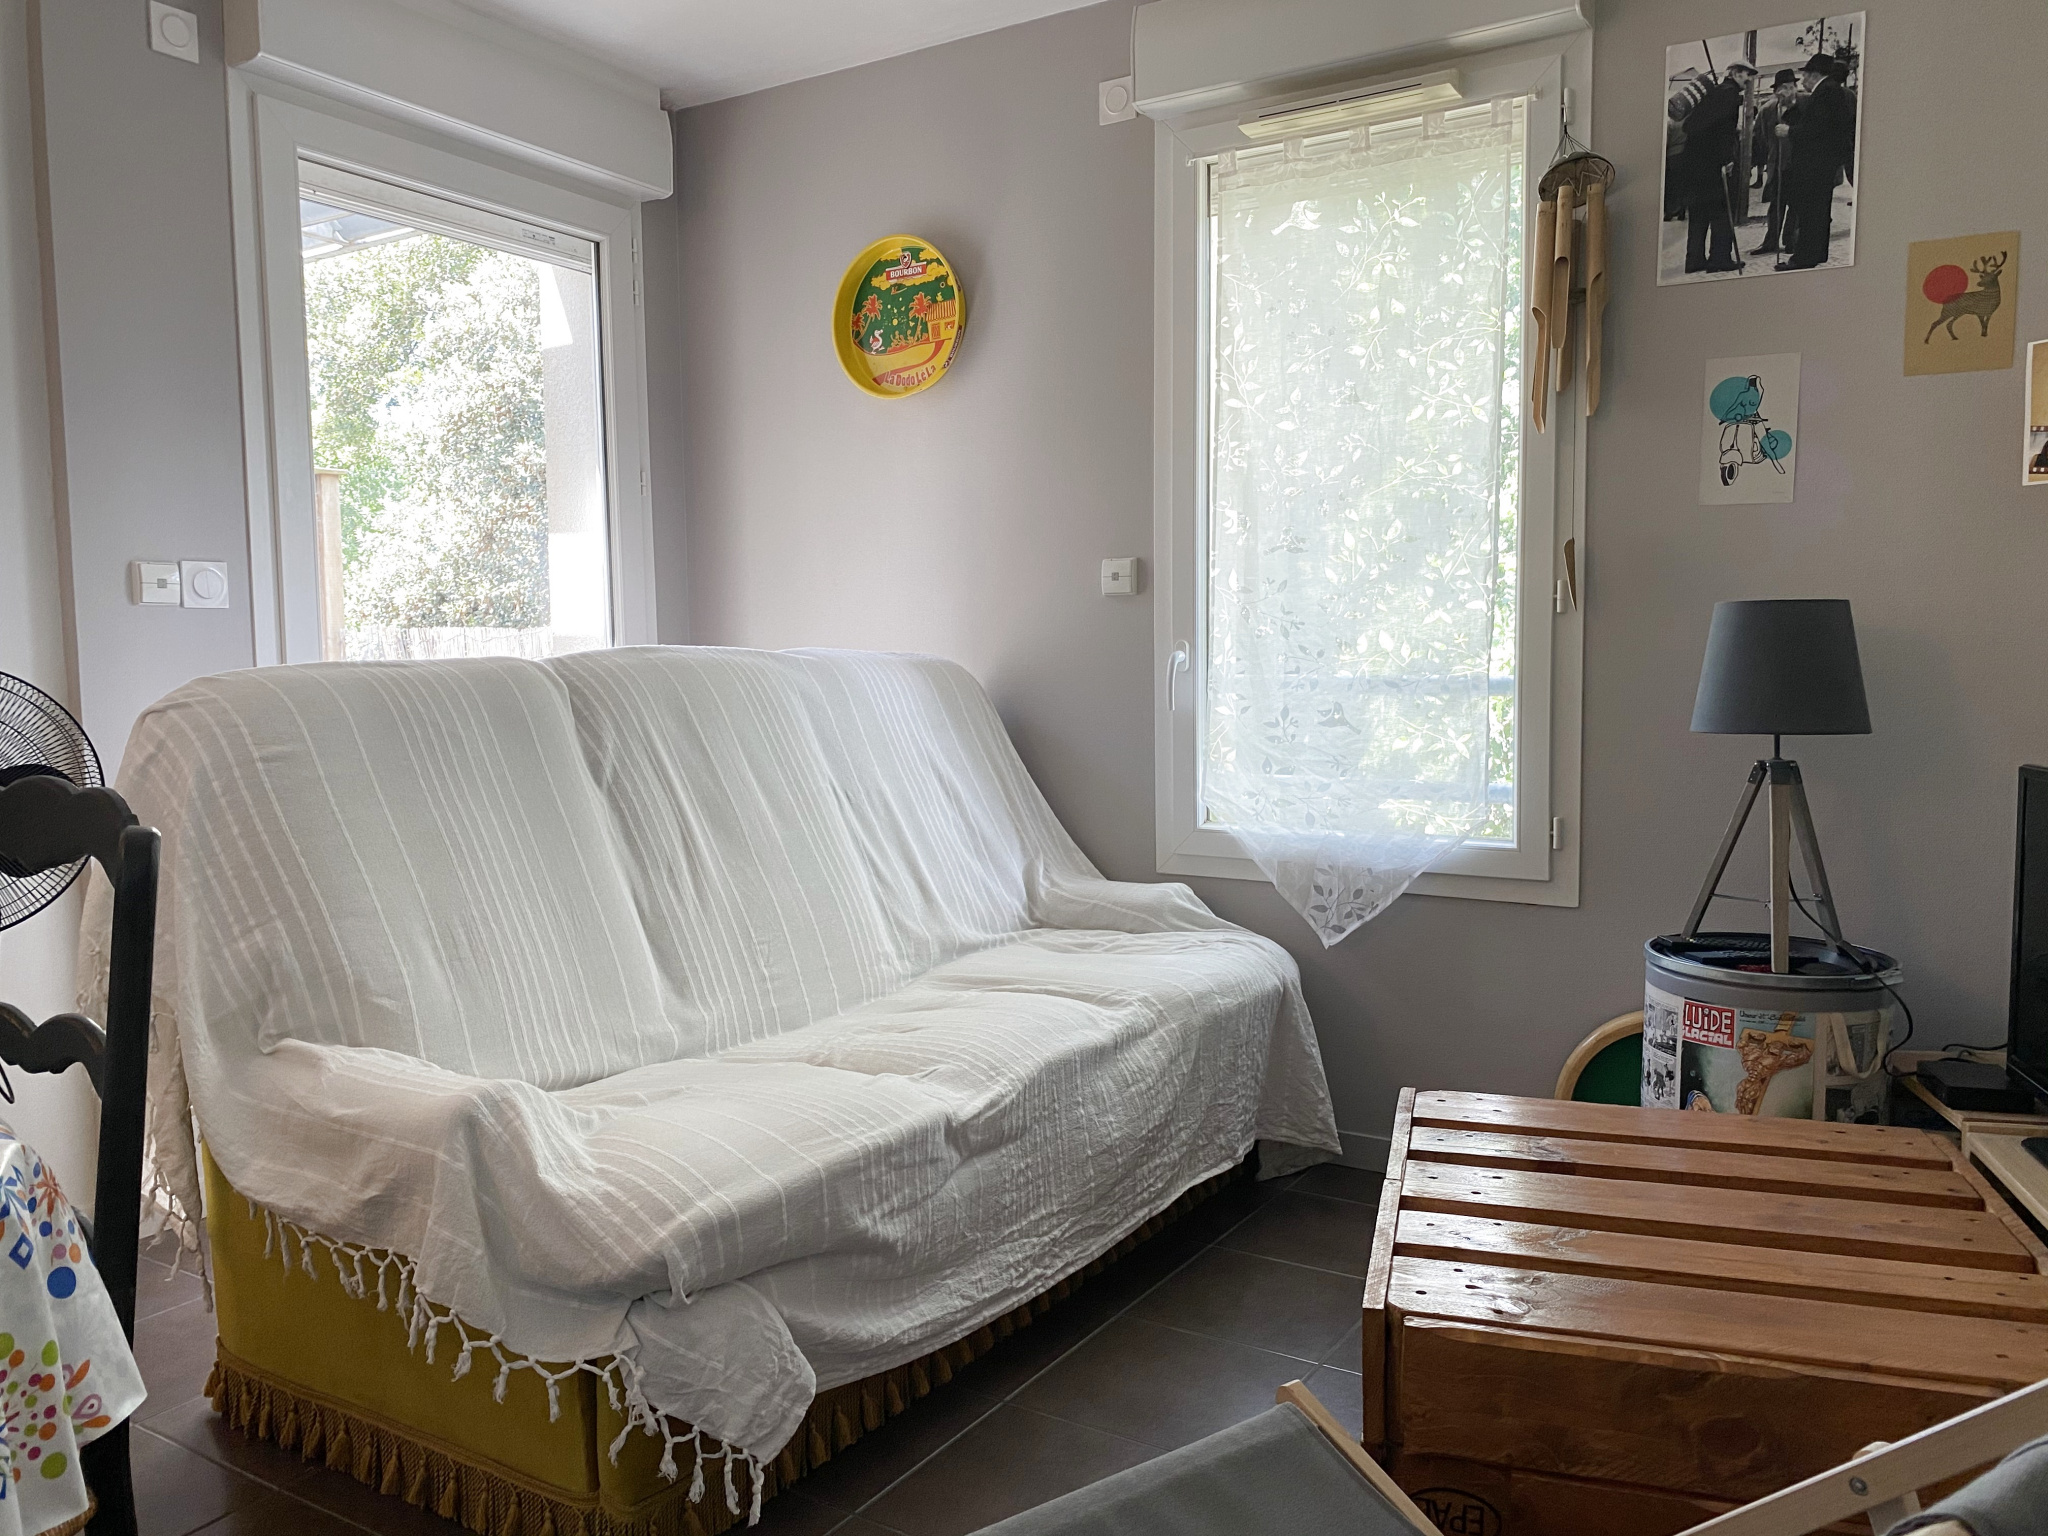 appartement la rochelle TYPE 2 AVEC TERRASSE ET GARAGE